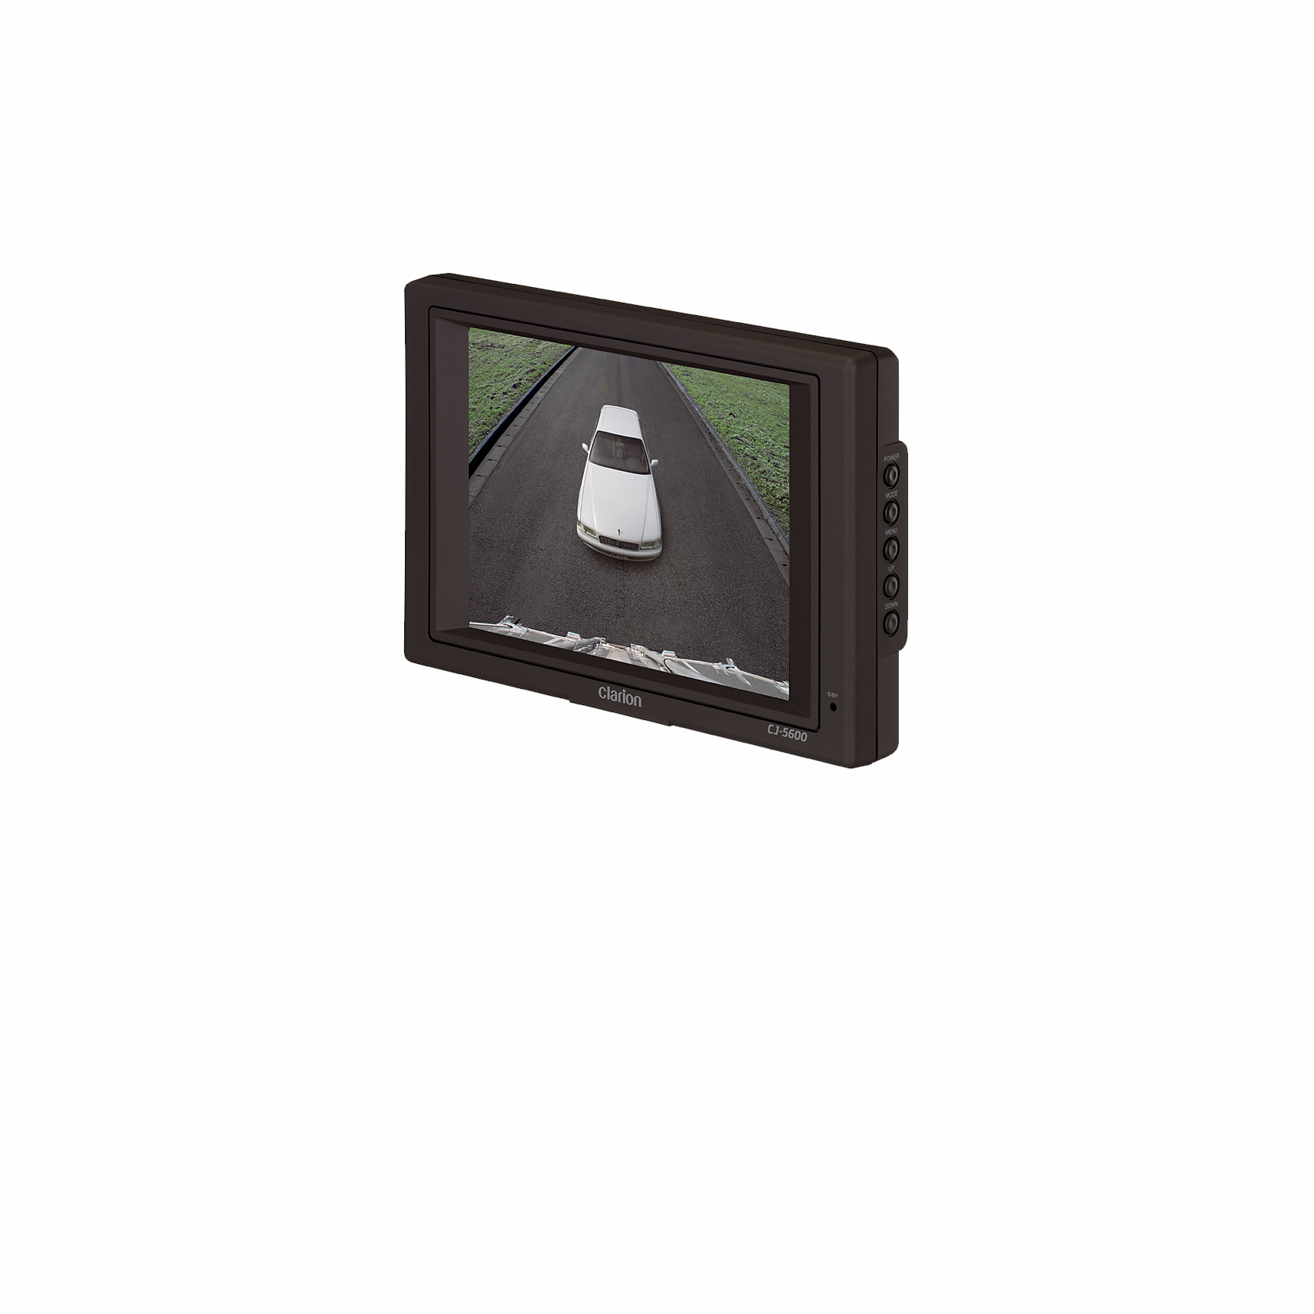 5.6inch LCD Monitor